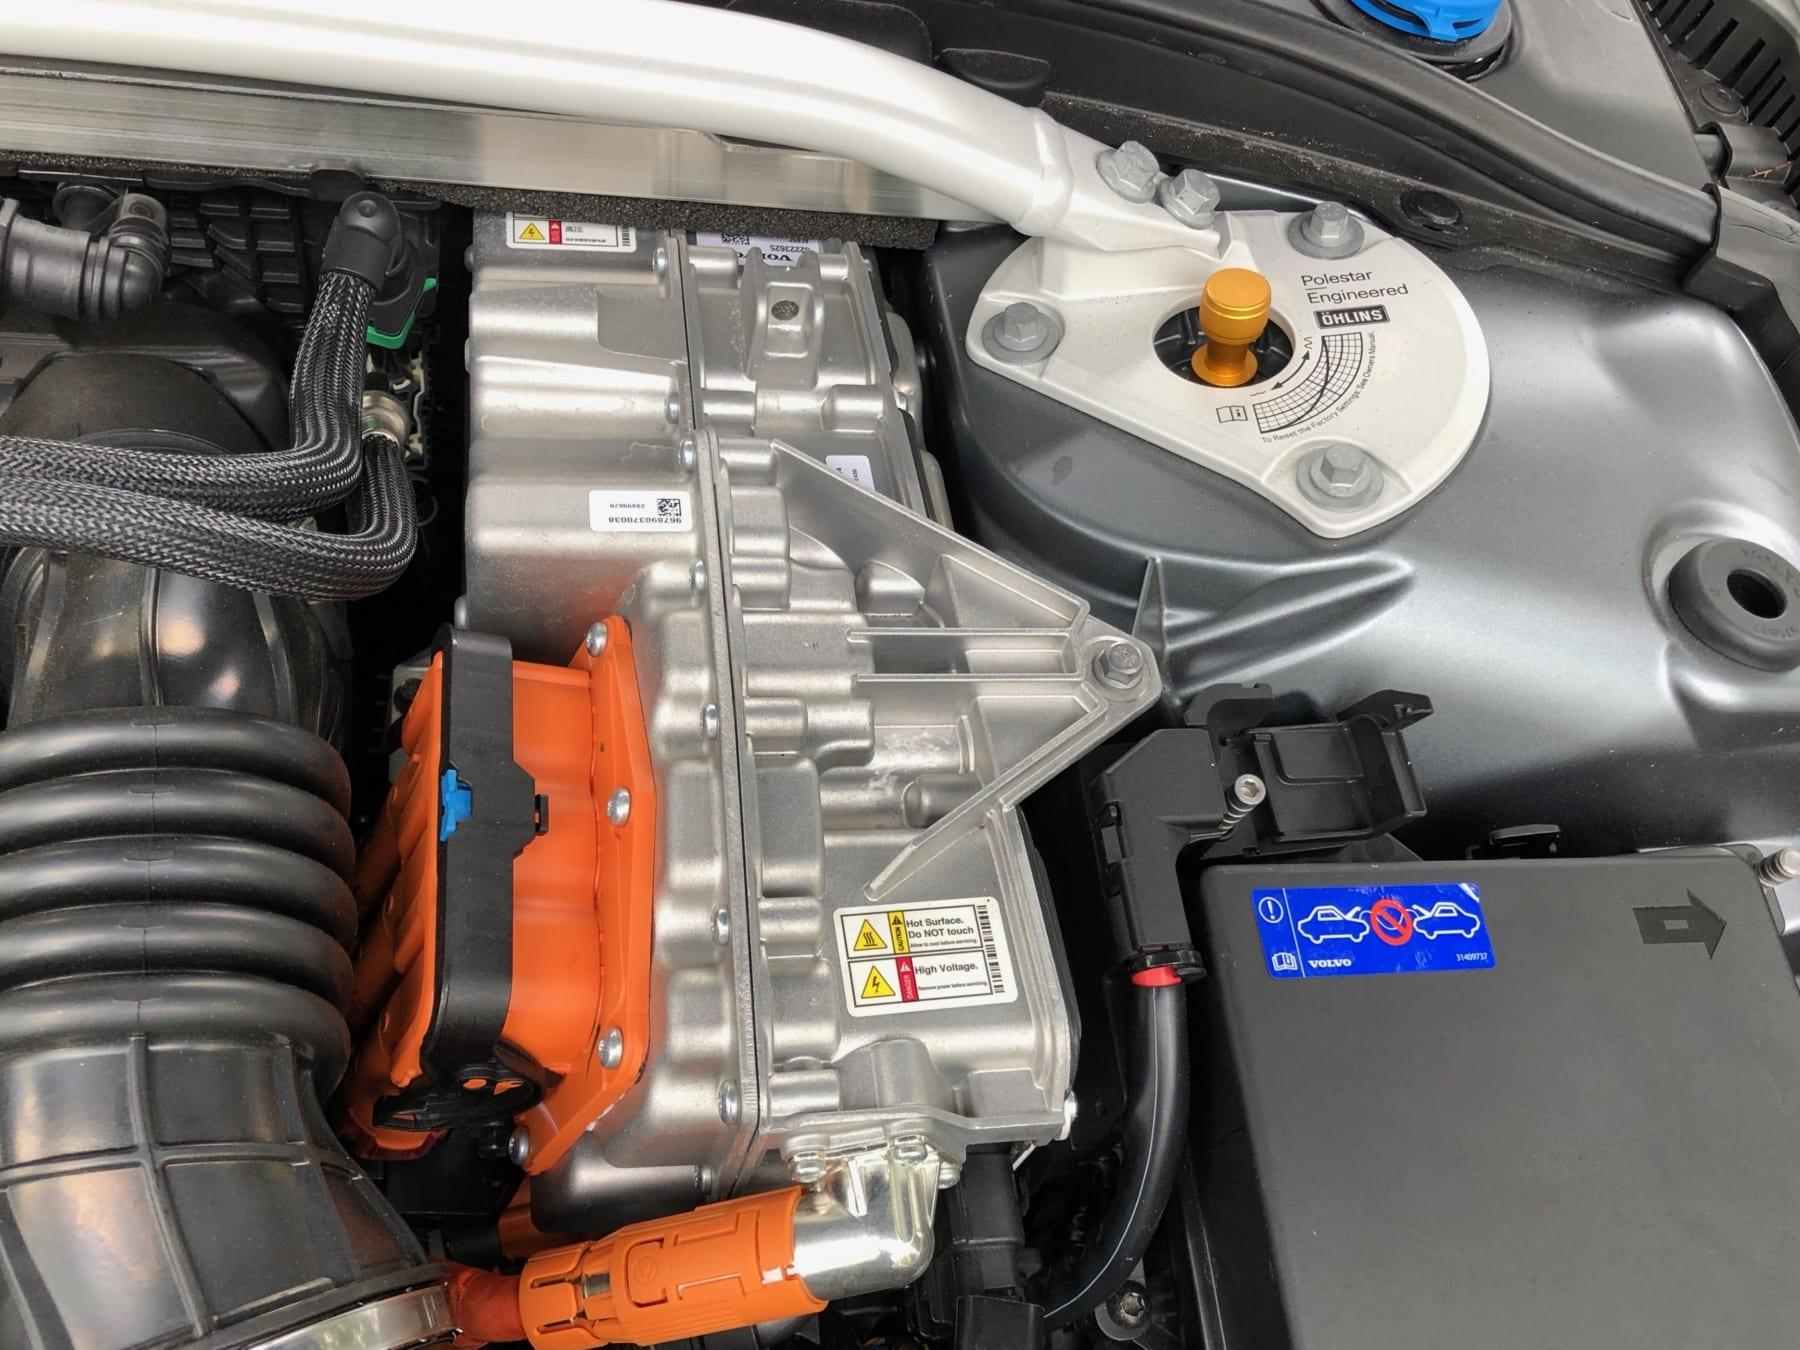 2020 Volvo S60 T8 Polestar Engineered